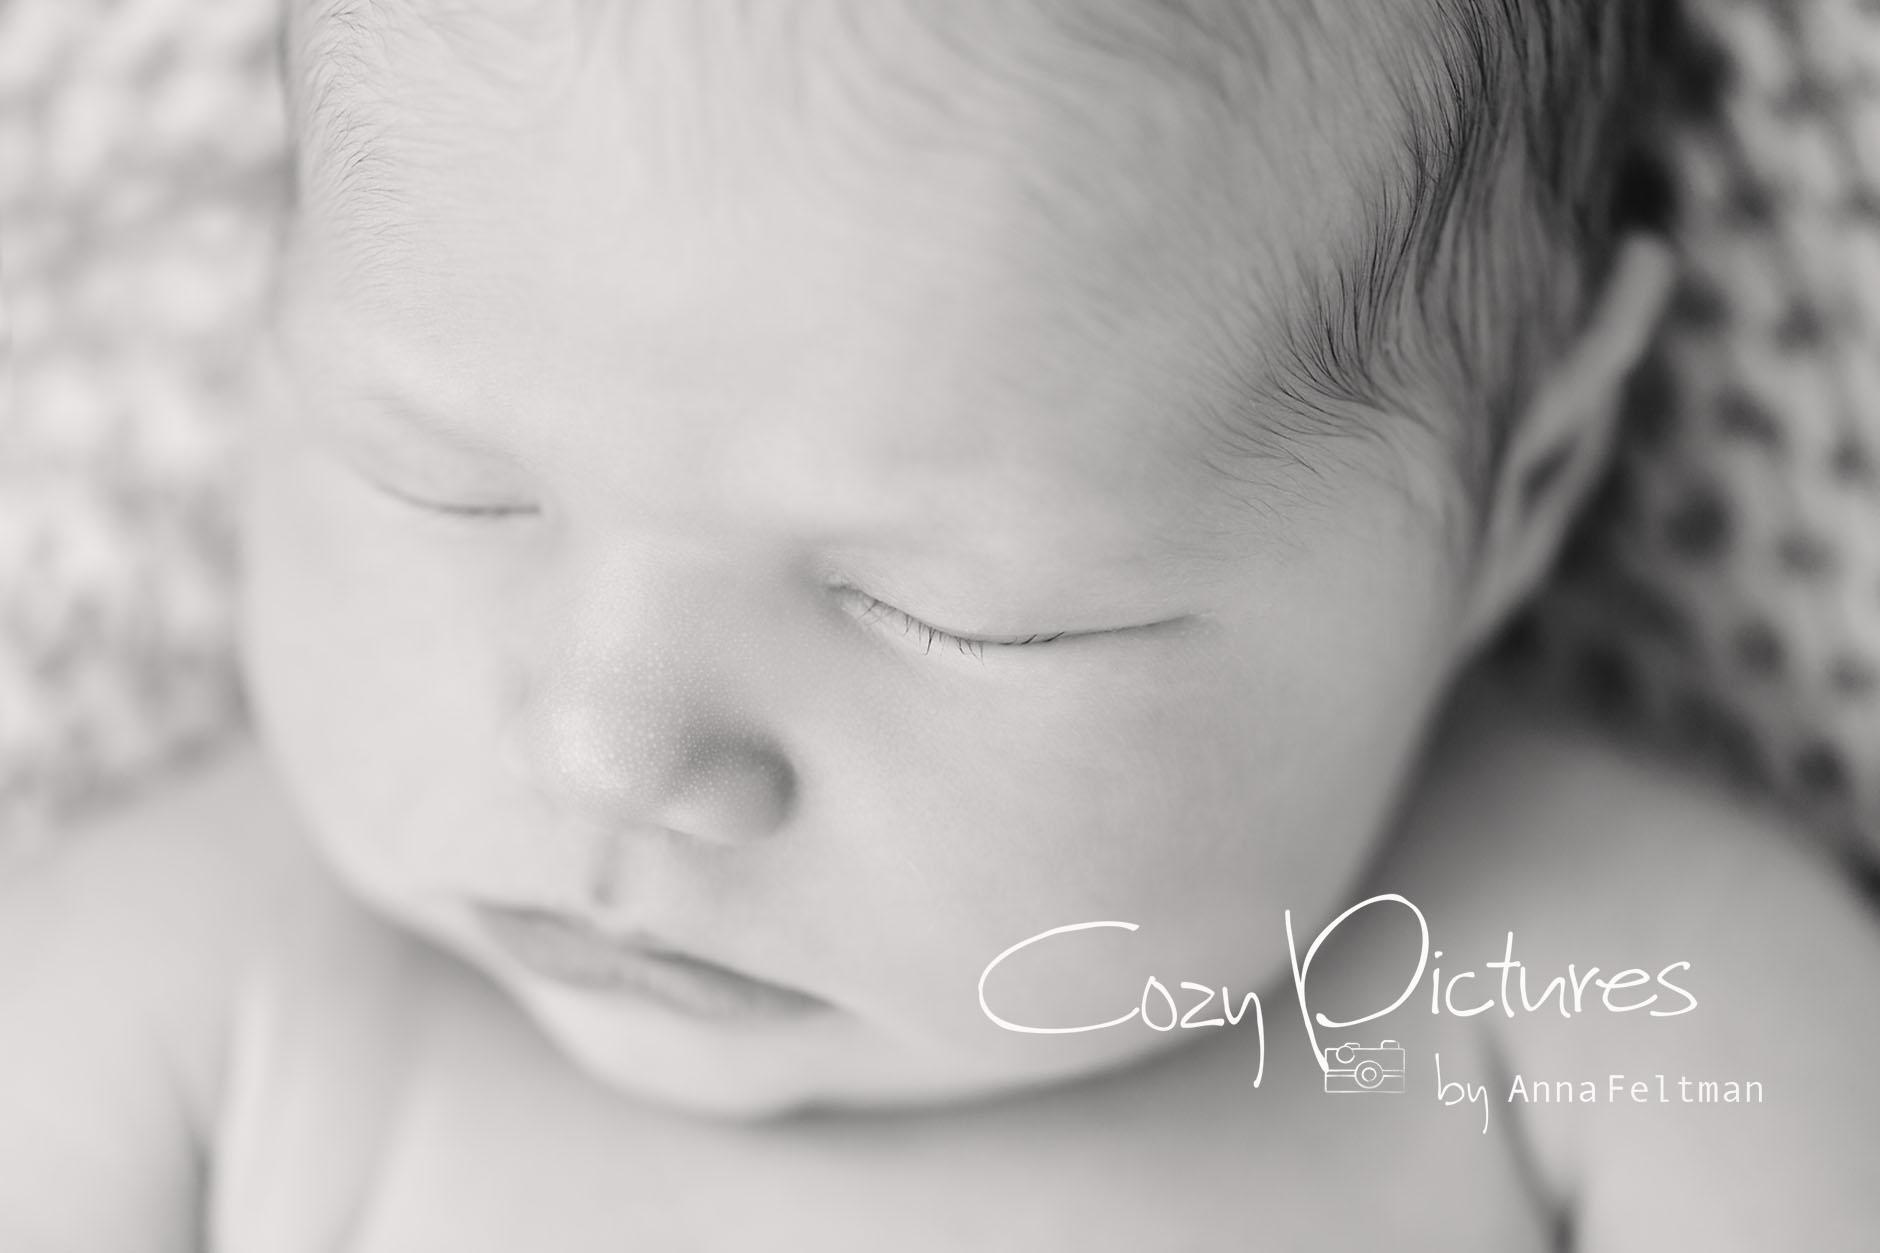 Newborn_Orlando_4_cozy_pictures.jpg